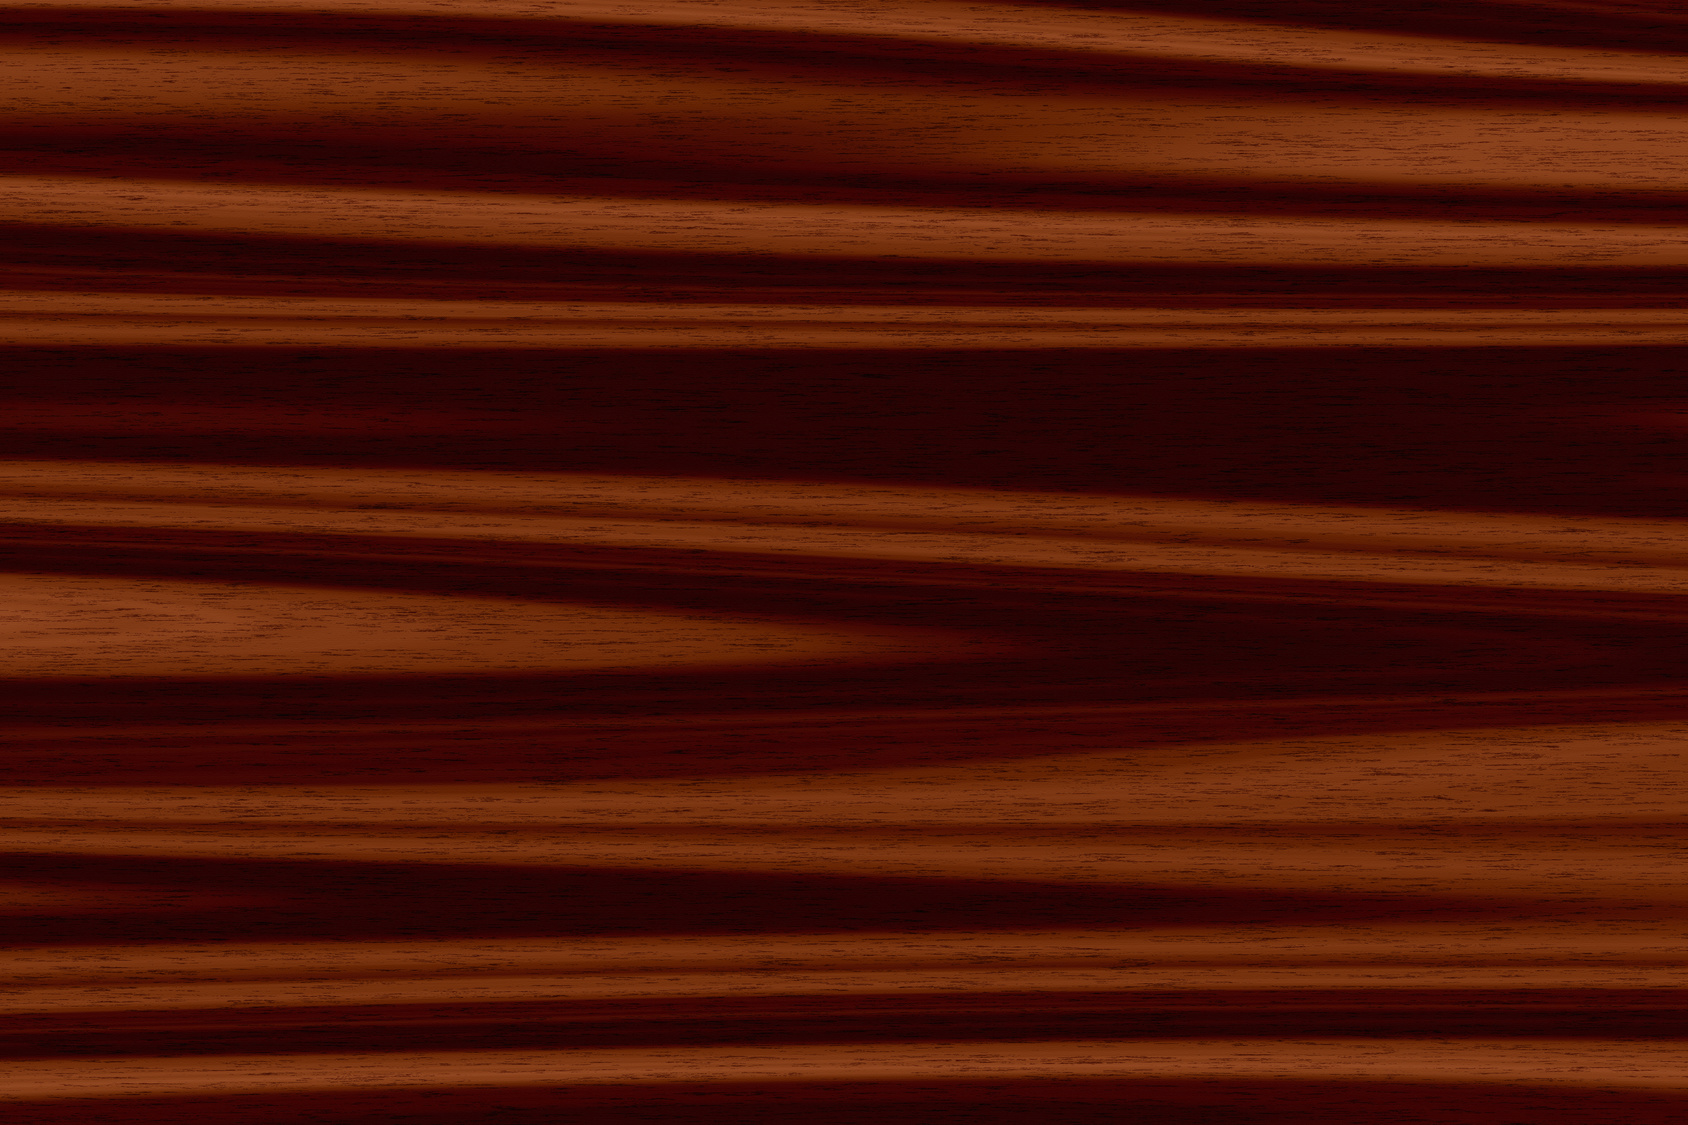 Image de bois d'Ebene de Macassar